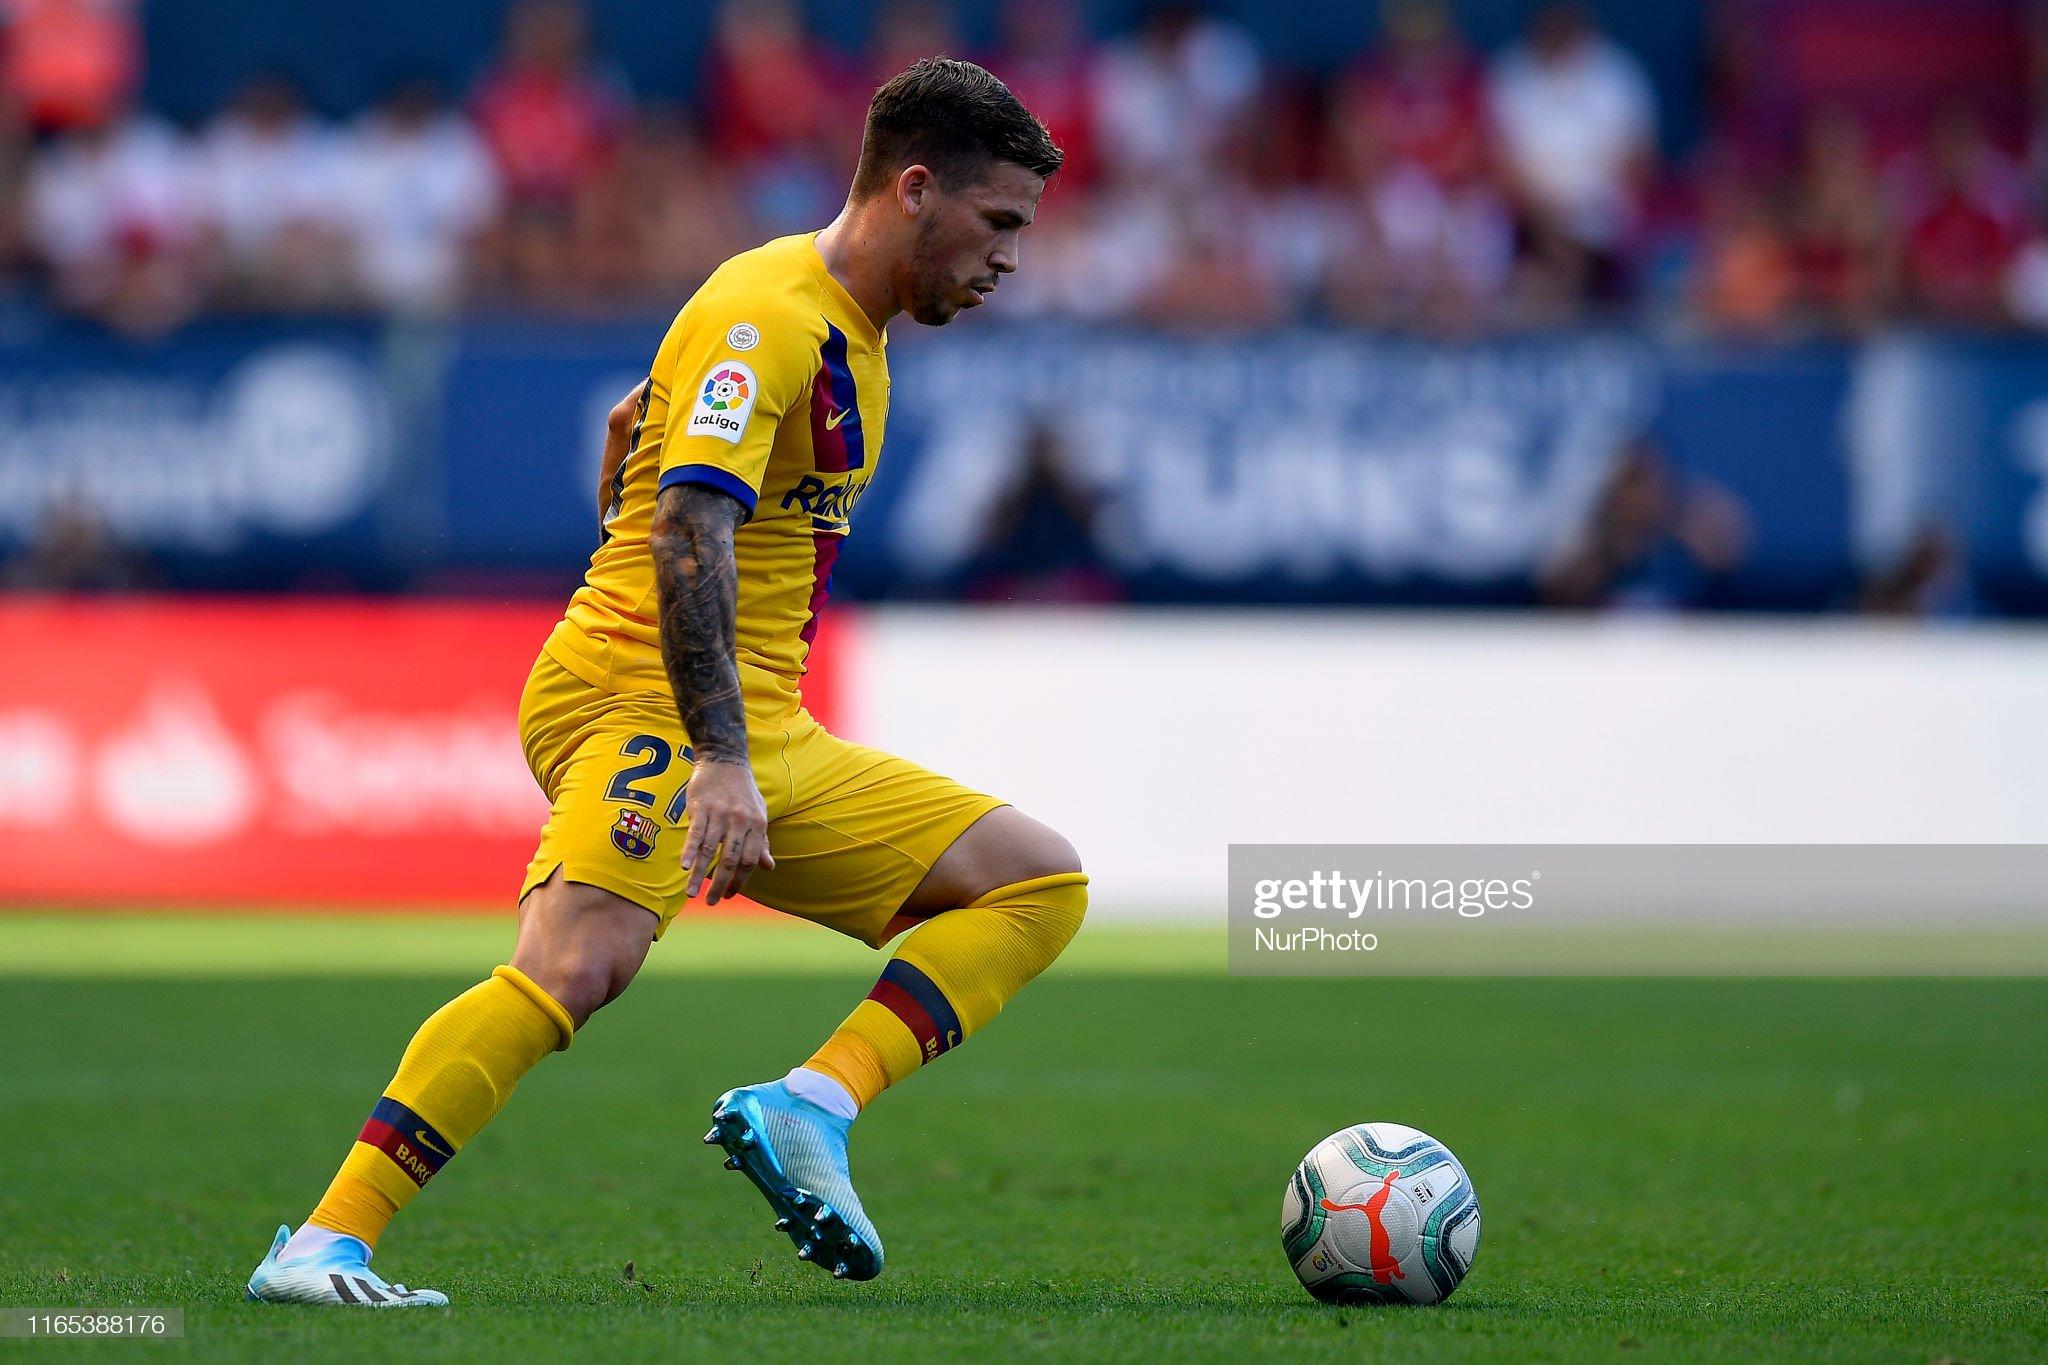 صور مباراة : أوساسونا - برشلونة 2-2 ( 31-08-2019 )  Carles-perez-of-barcelona-controls-the-ball-during-the-liga-match-ca-picture-id1165388176?s=2048x2048